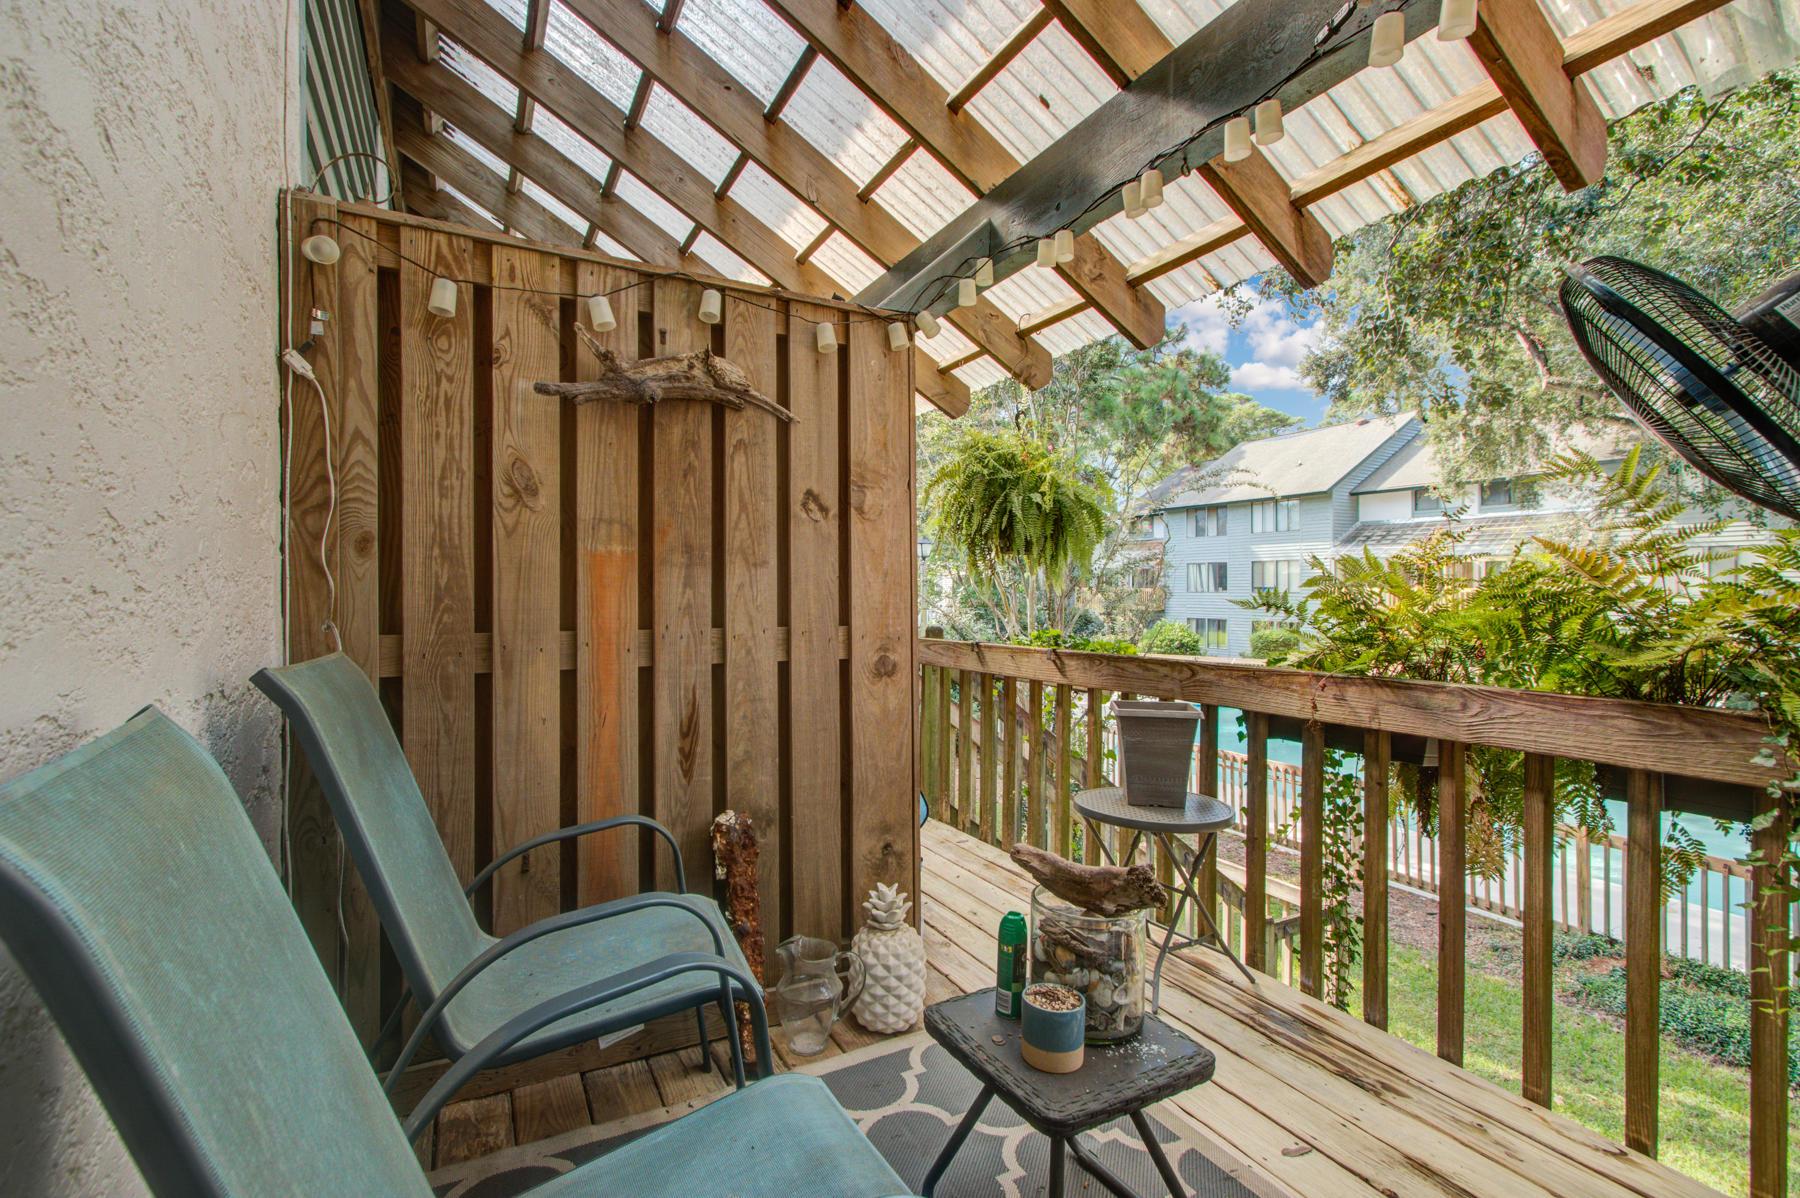 Snee Farm Lakes Homes For Sale - 1120 Hidden Cove, Mount Pleasant, SC - 17